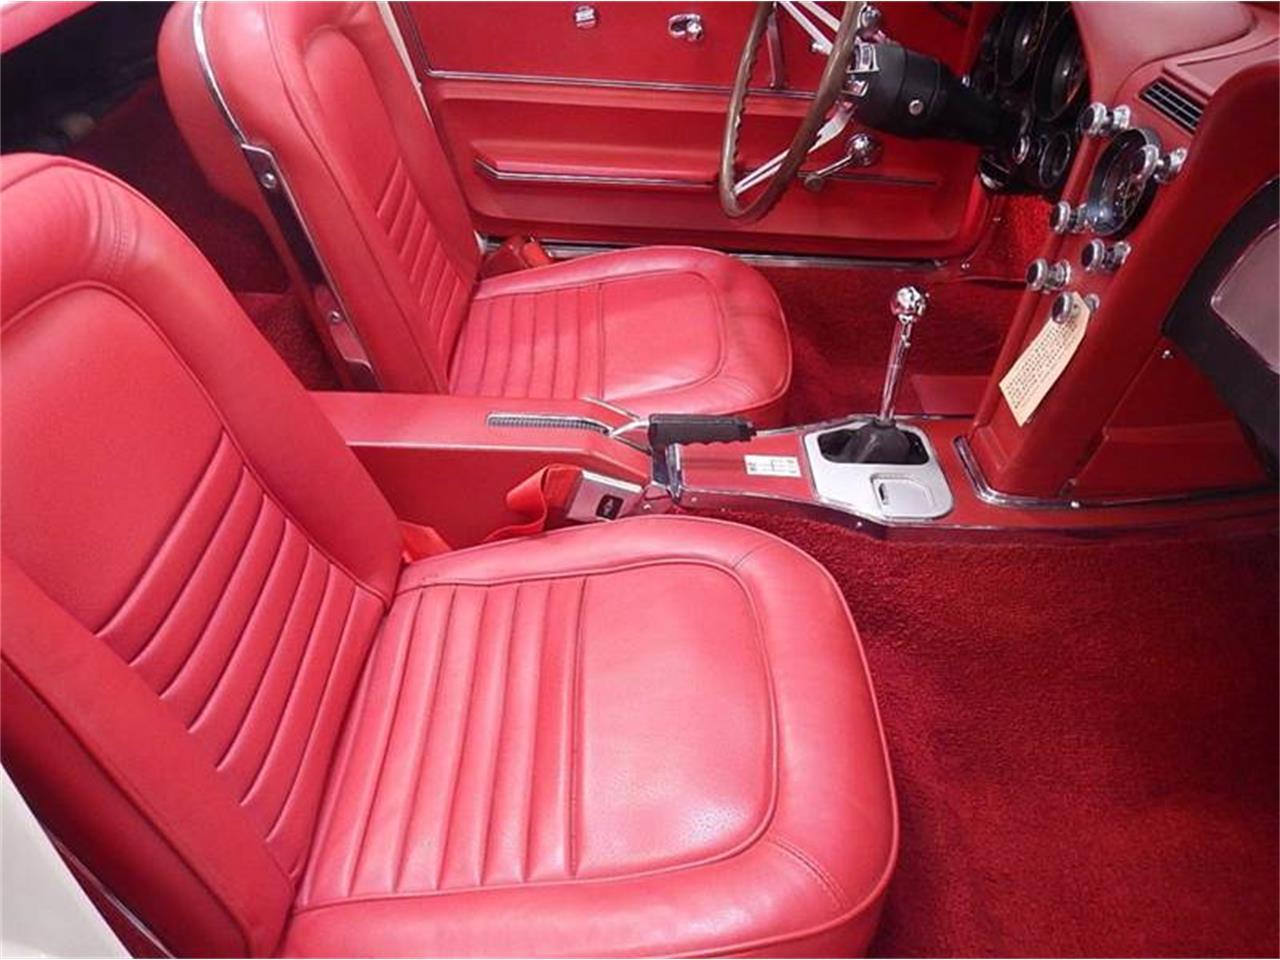 1967 Chevrolet Corvette (CC-1312979) for sale in Burr Ridge, Illinois